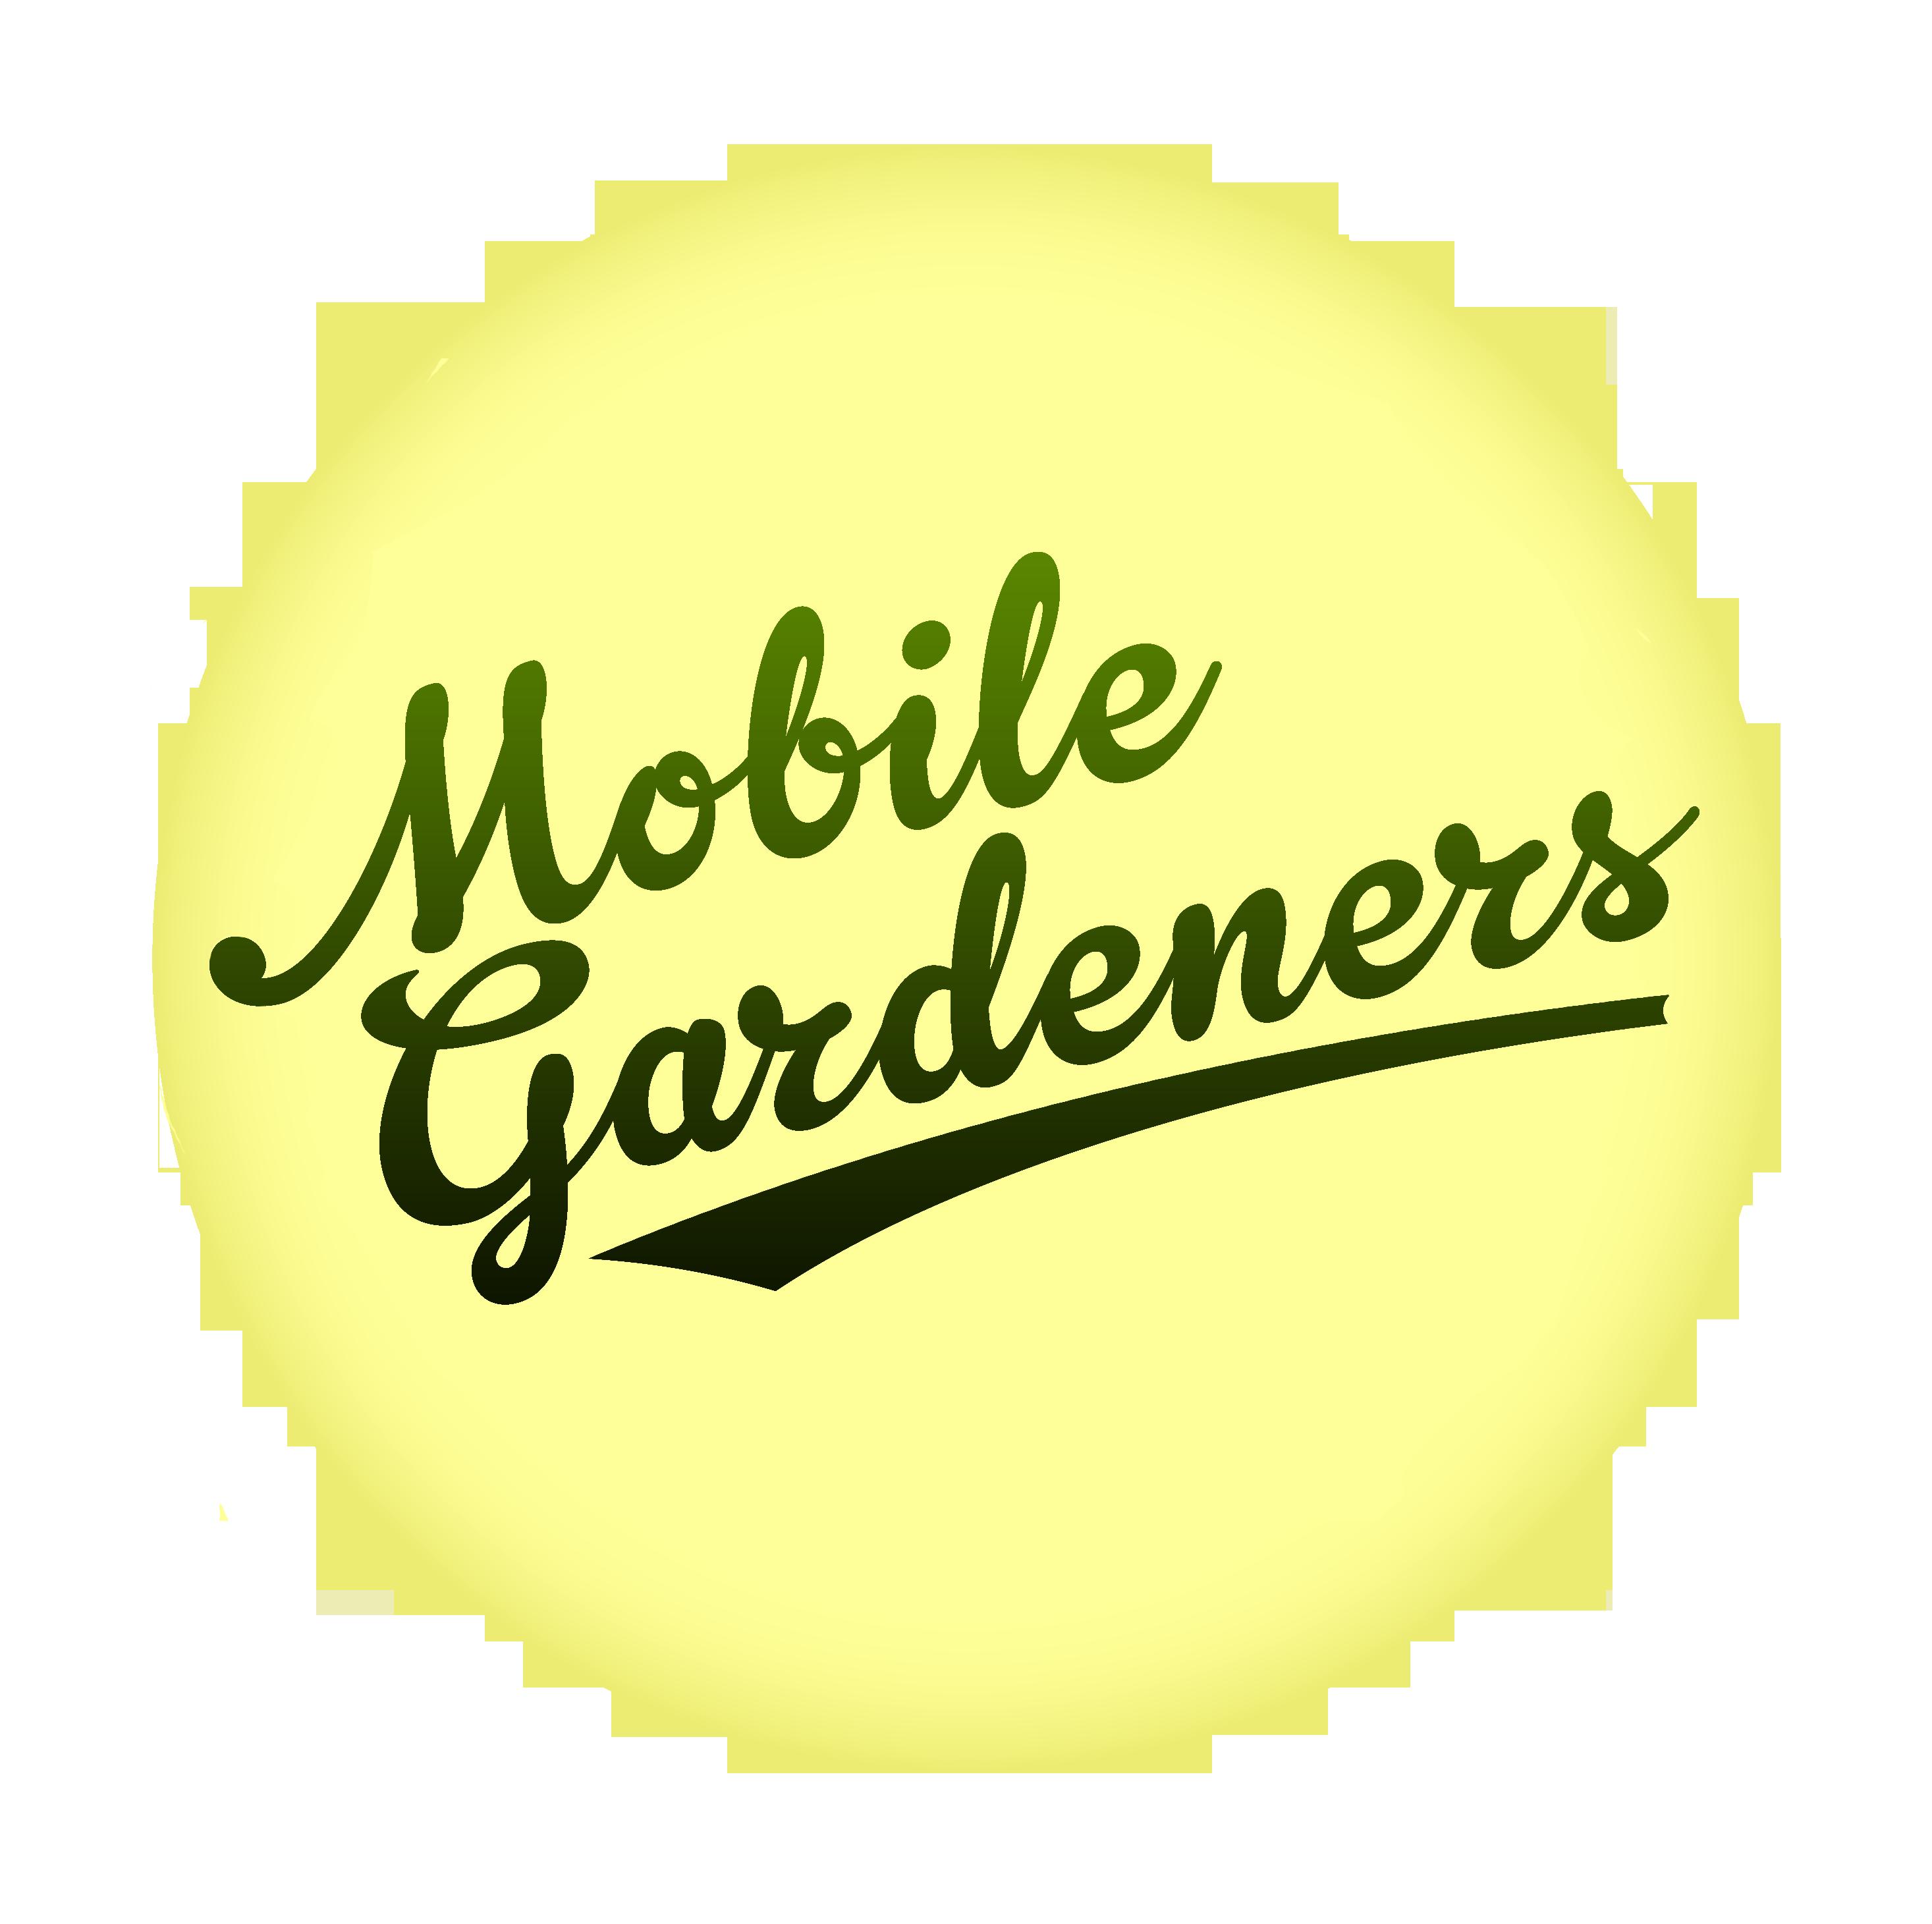 Mobile Gardeners